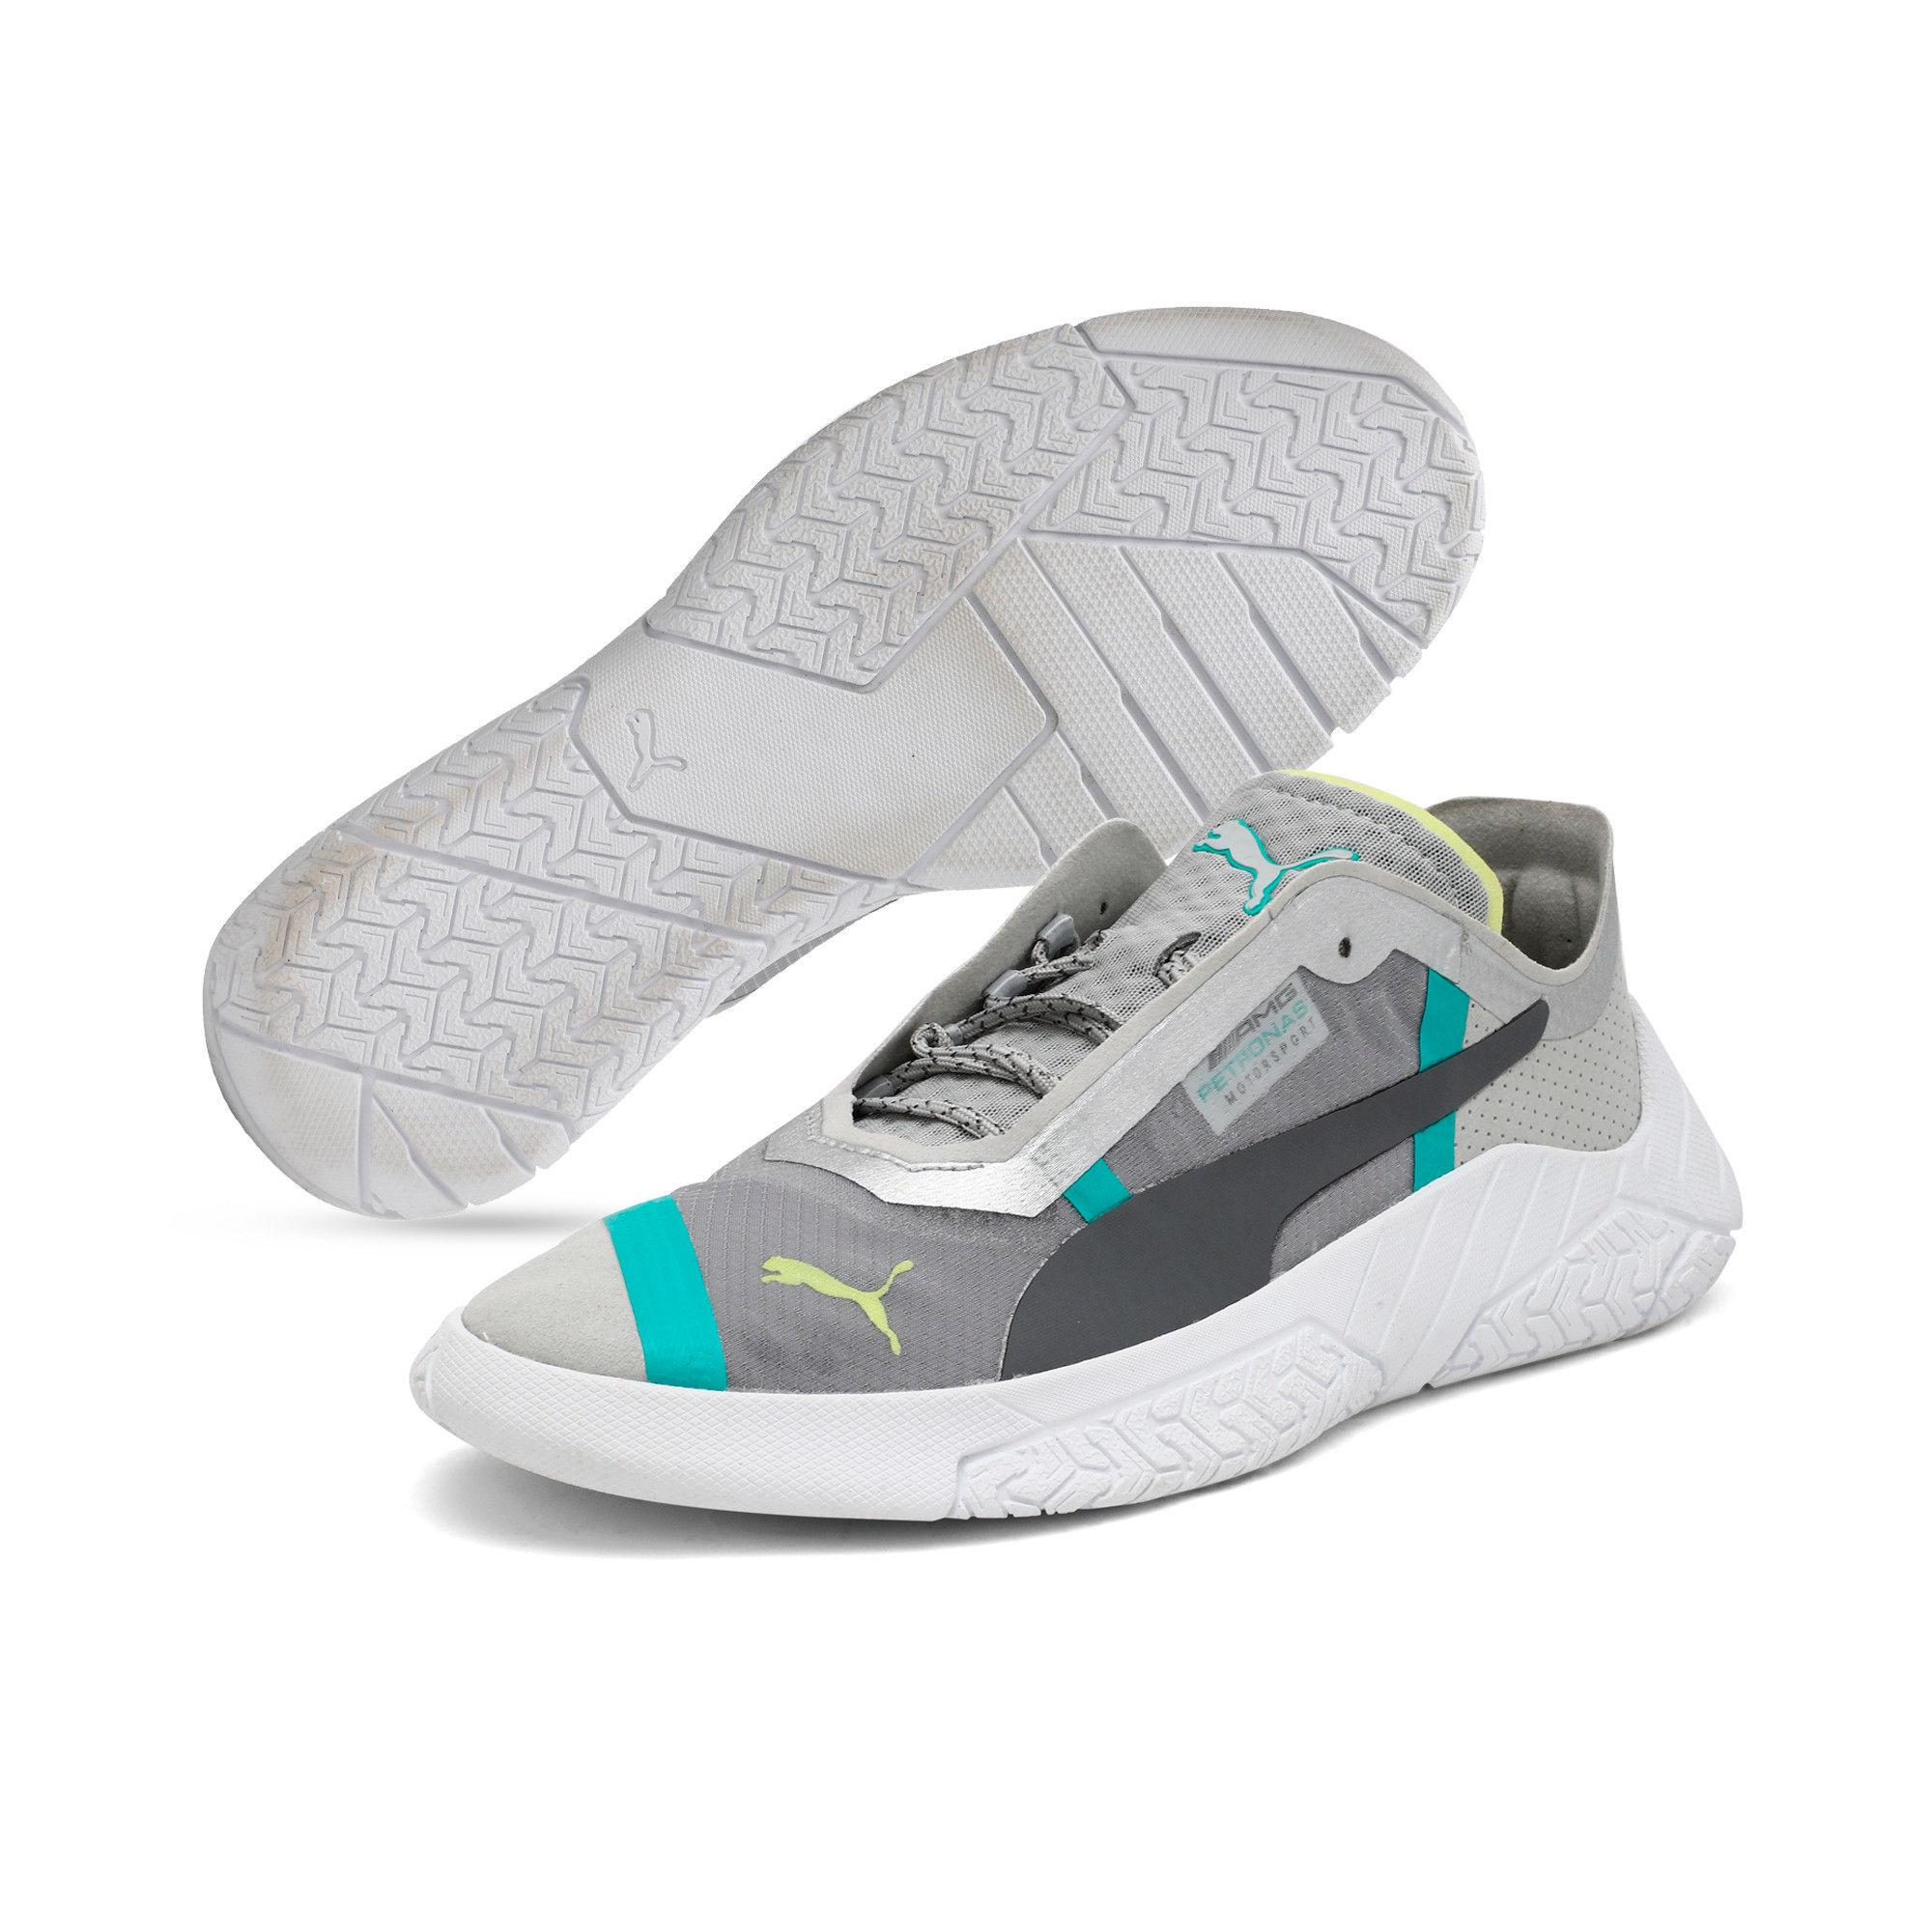 puma mercedes edition shoes